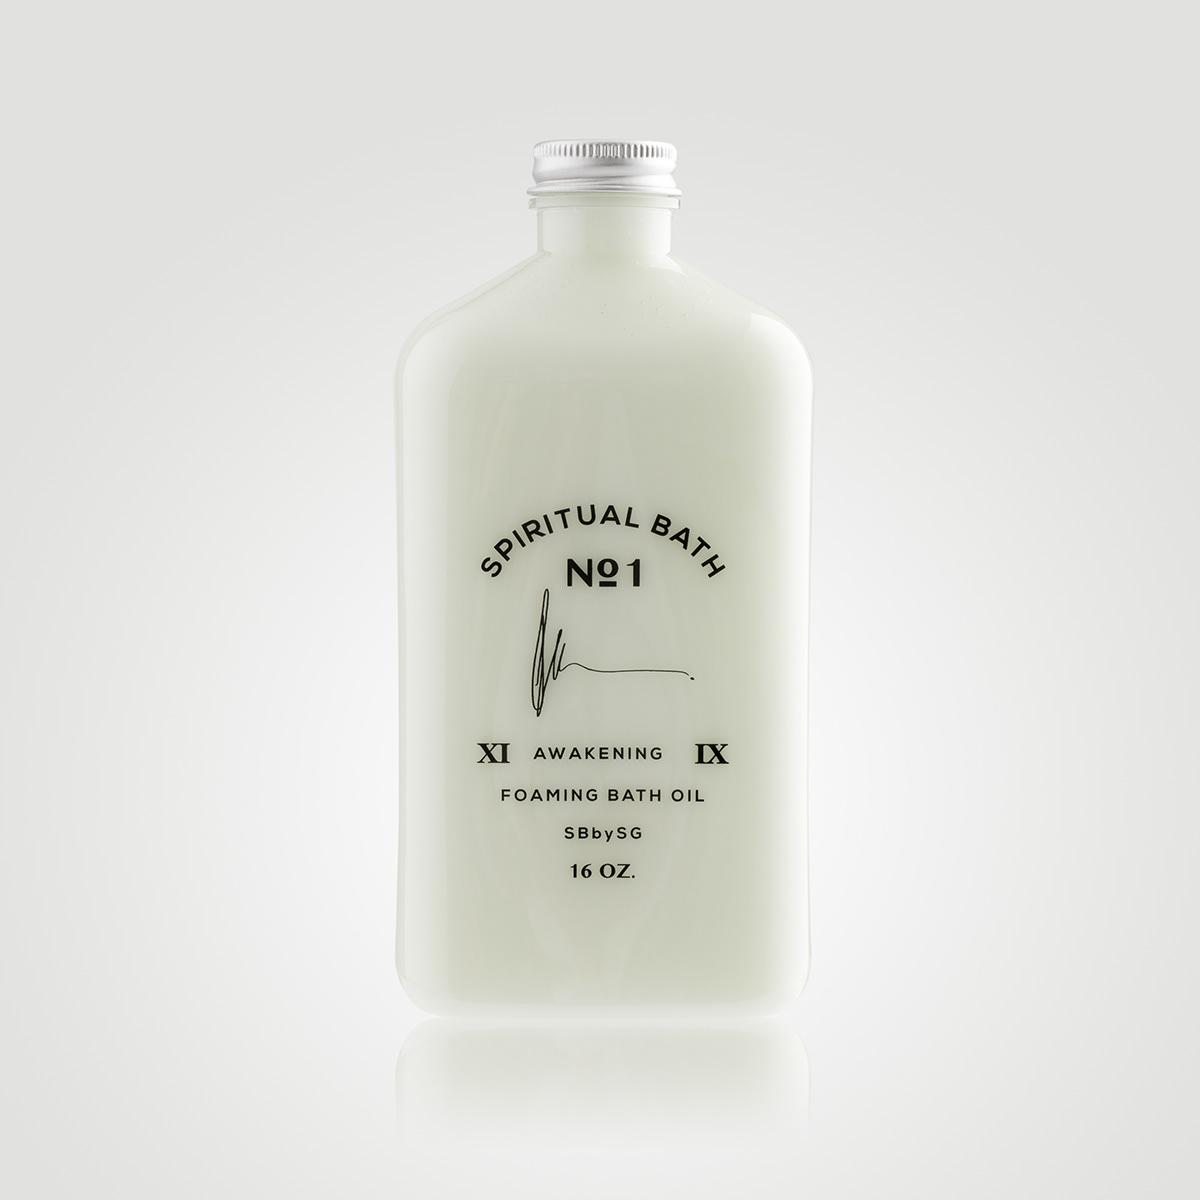 SBbySG Spiritual Bath - Packaging Design | Development on AIGA